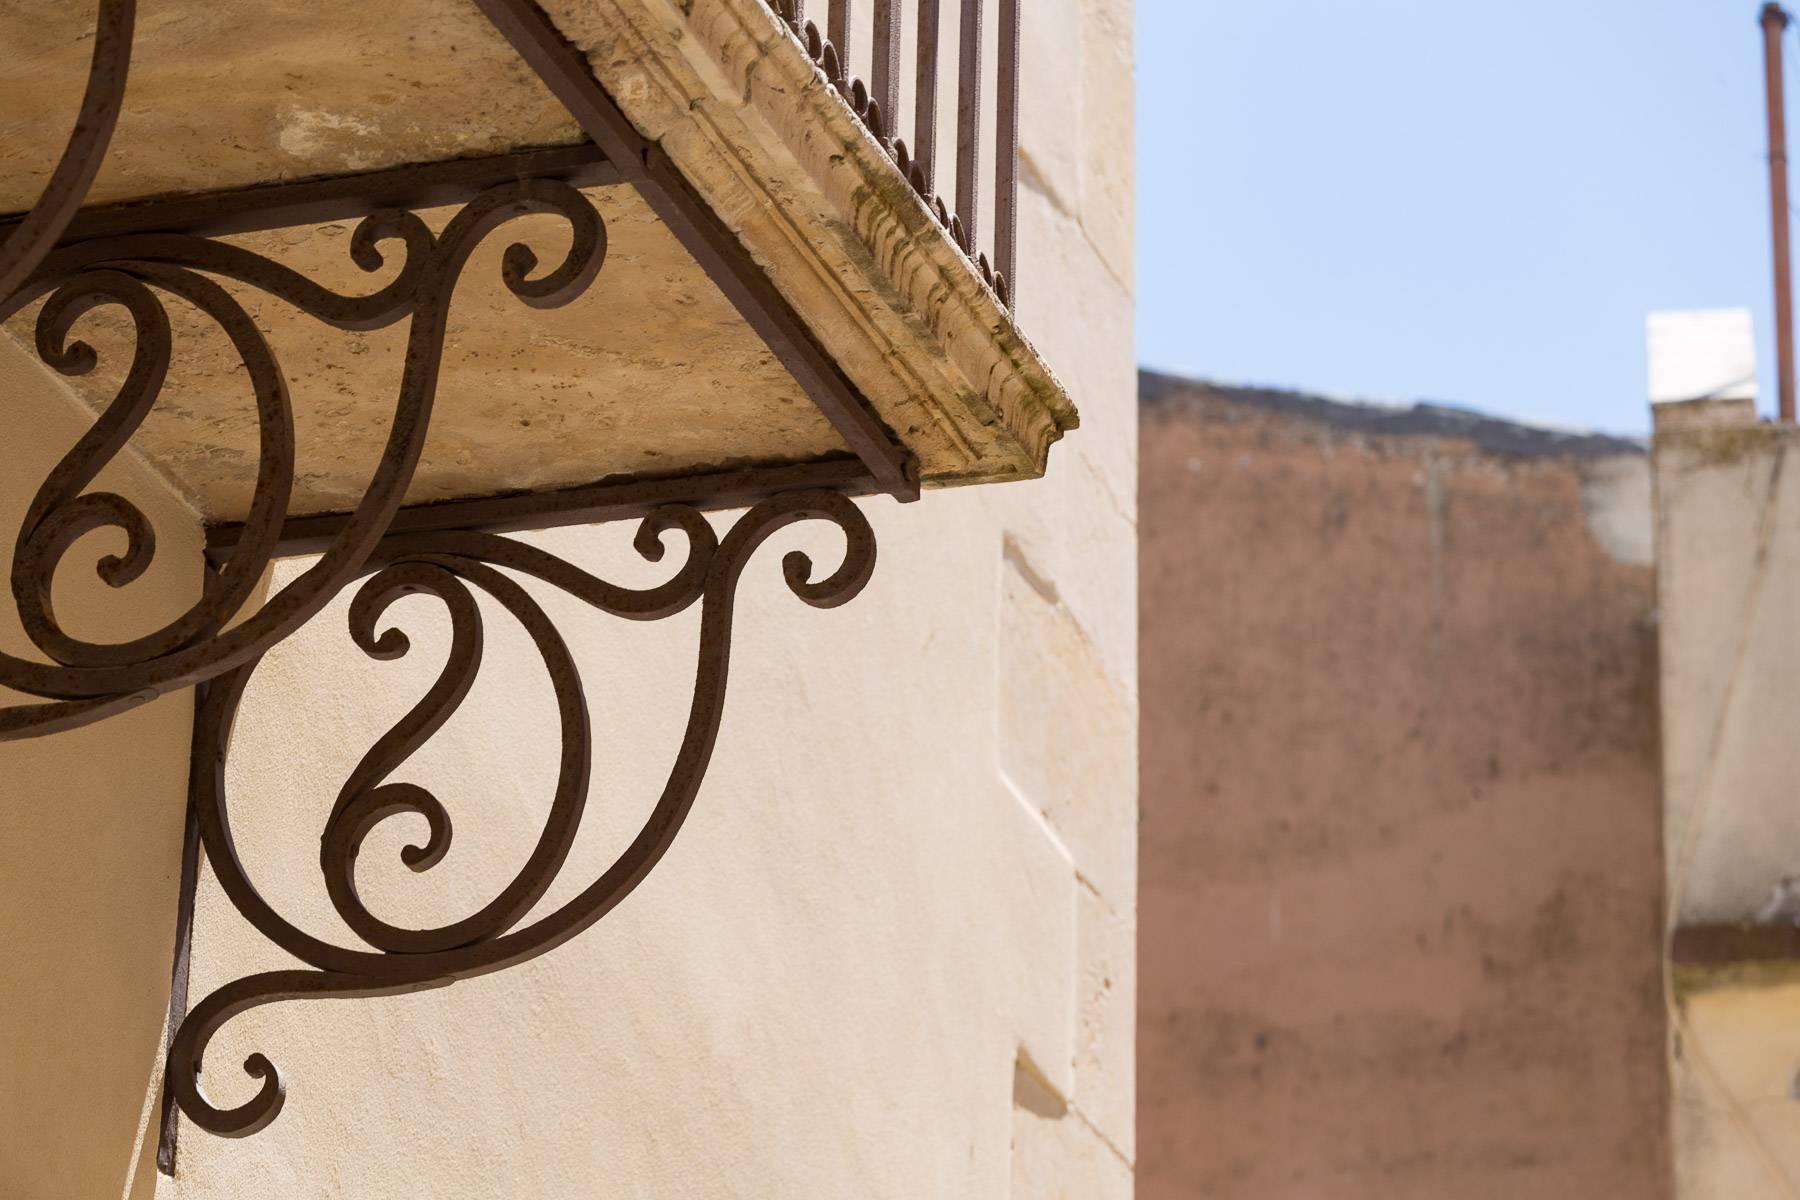 Casa indipendente in Vendita a Noto: 5 locali, 171 mq - Foto 8